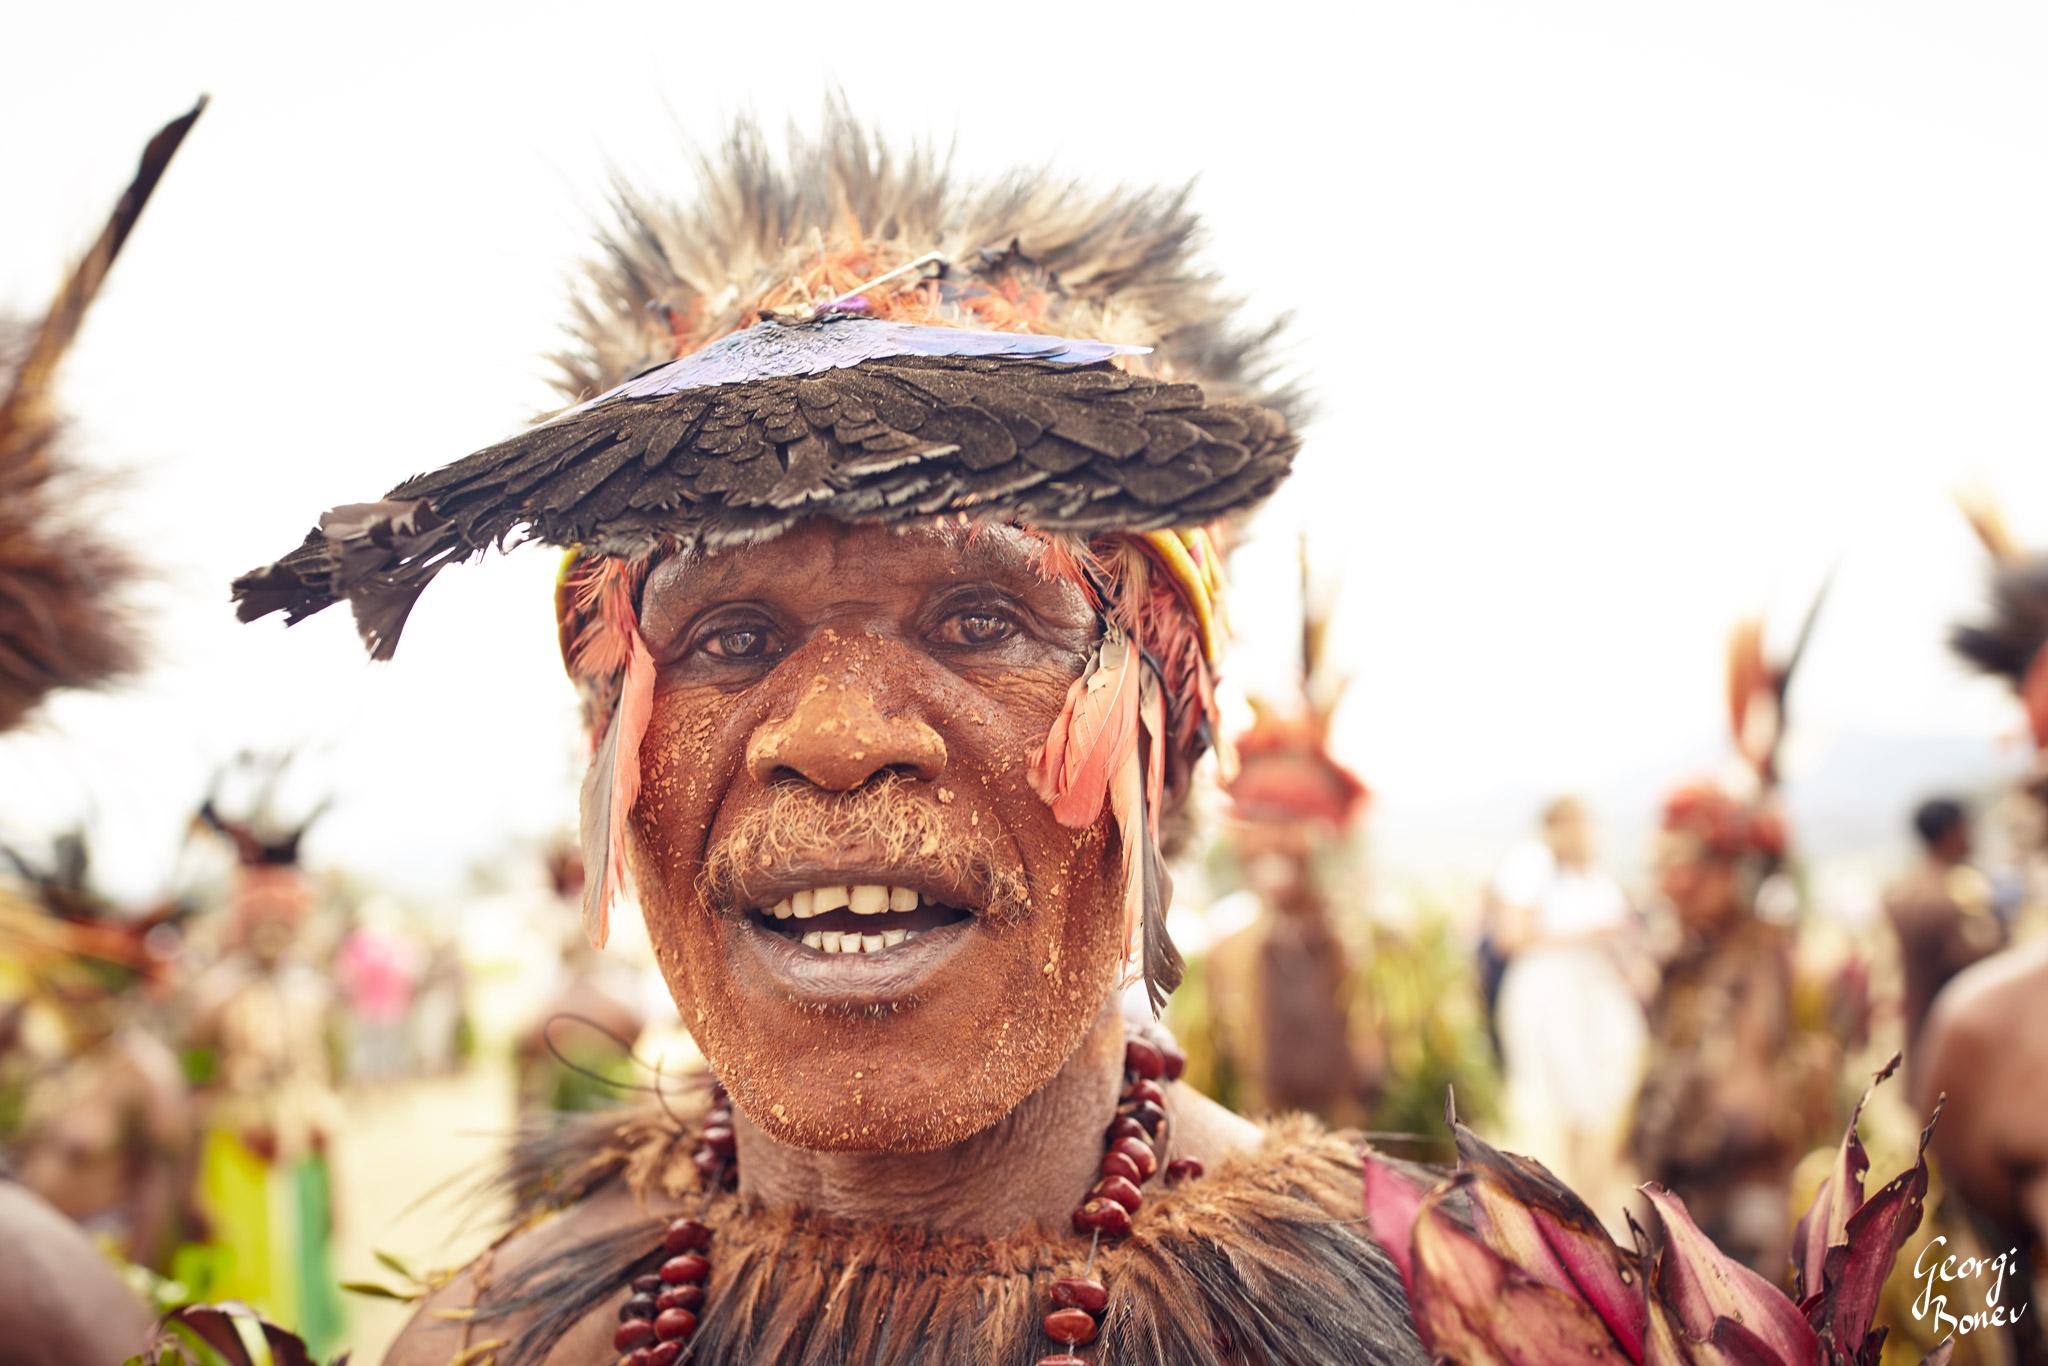 ATRIGU WARRIOR USES A WING OF A BIRD AS DOCORATION, PAPUA NEW GUINEA